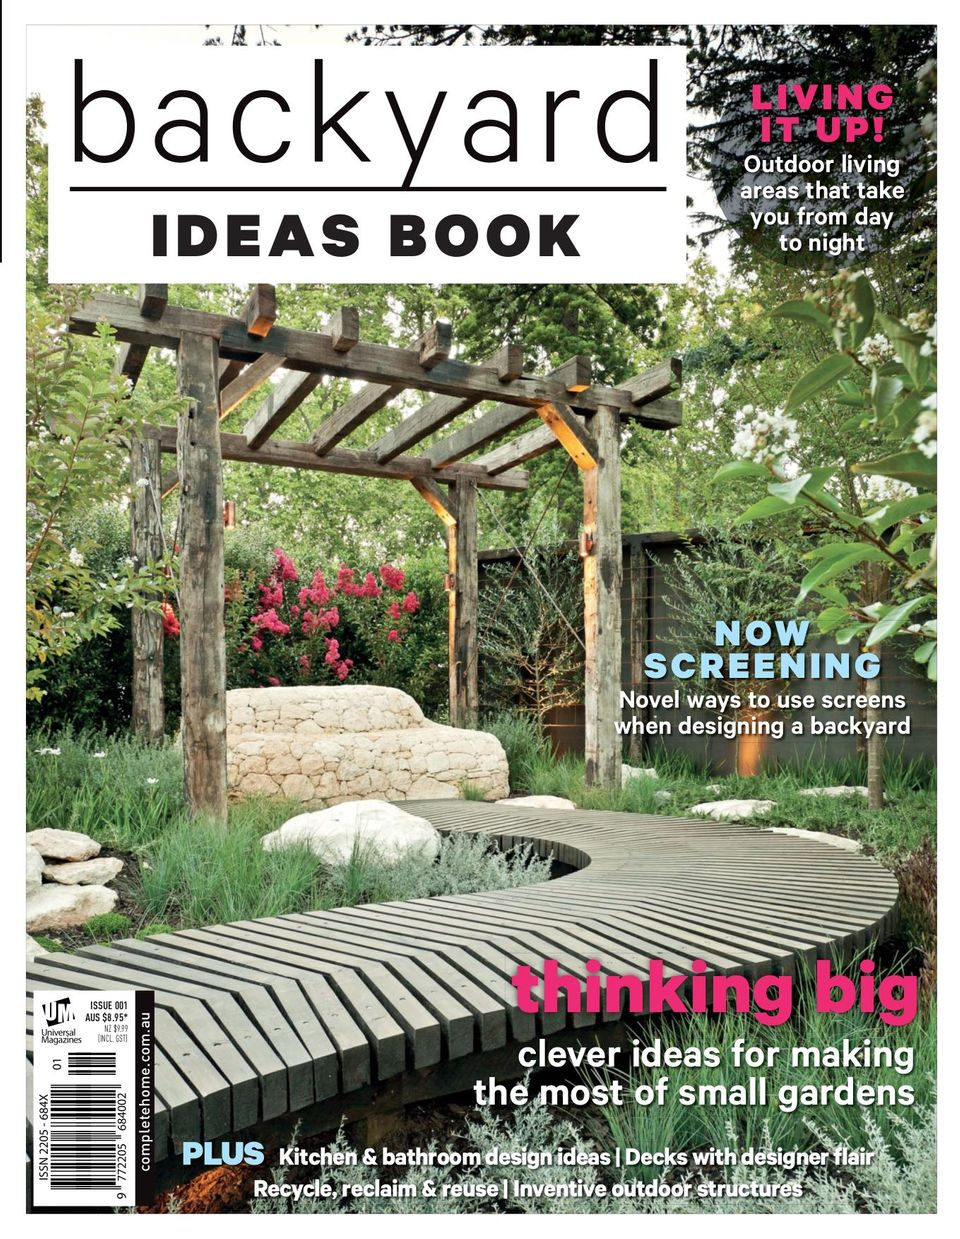 Get Your Digital Copy Of Backyard Garden Design Ideas Backyard Ideas Book 1